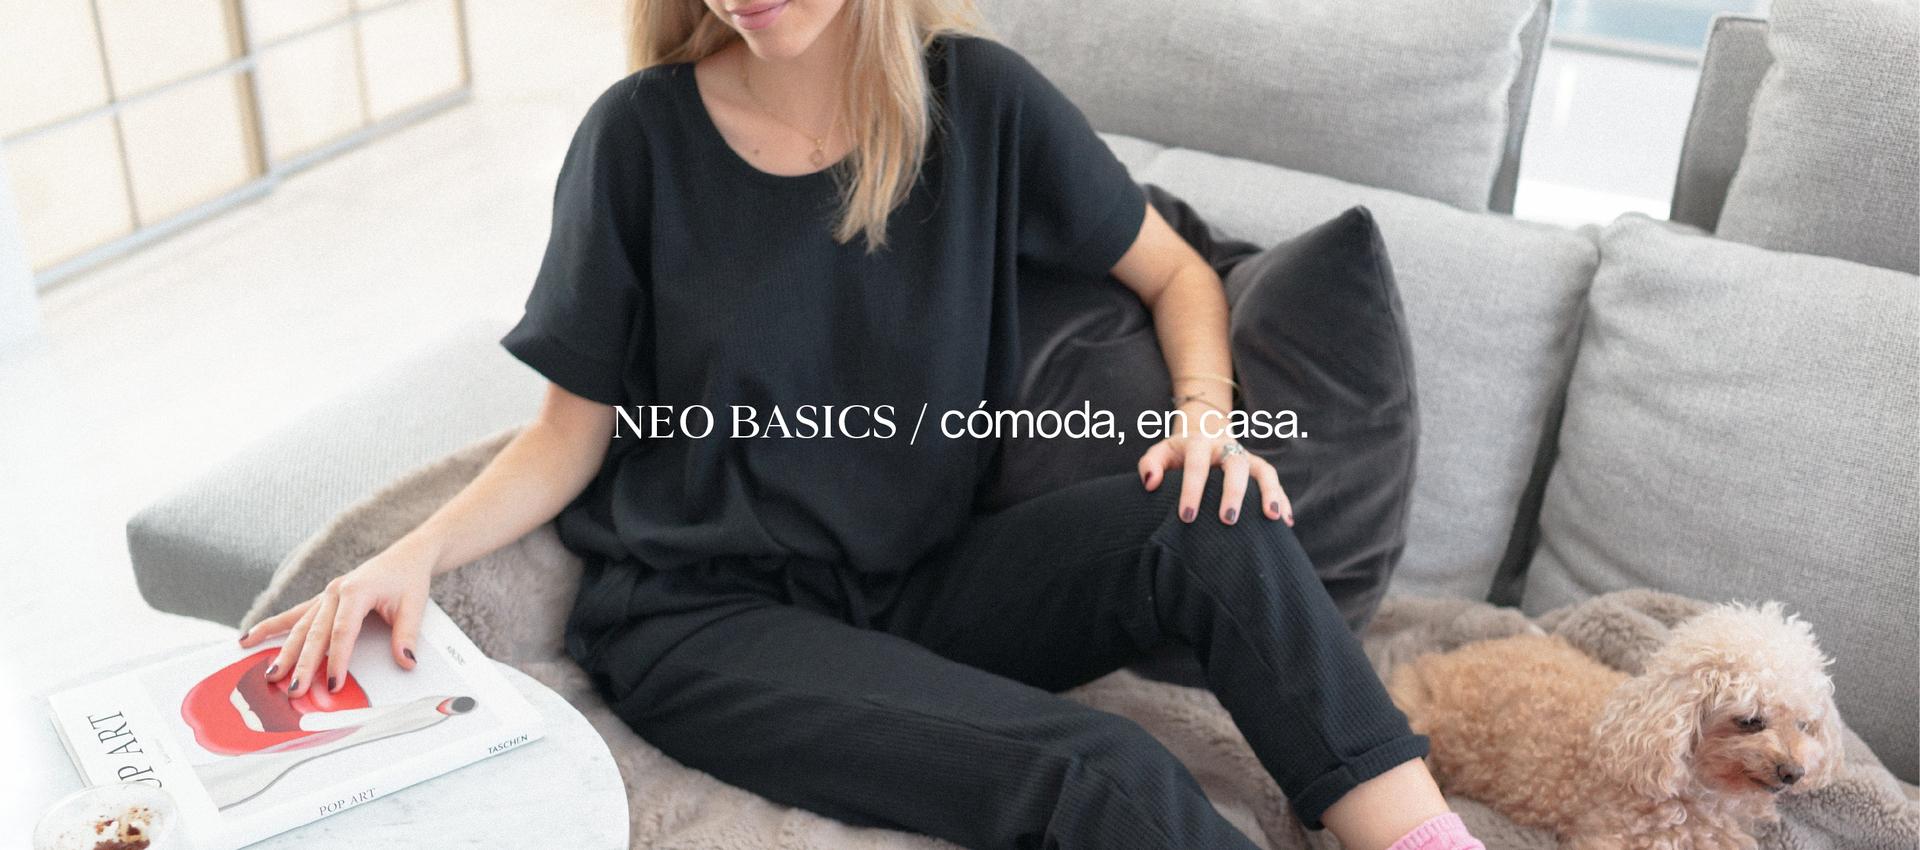 Neo Basics, ropa para estar cómoda en casa